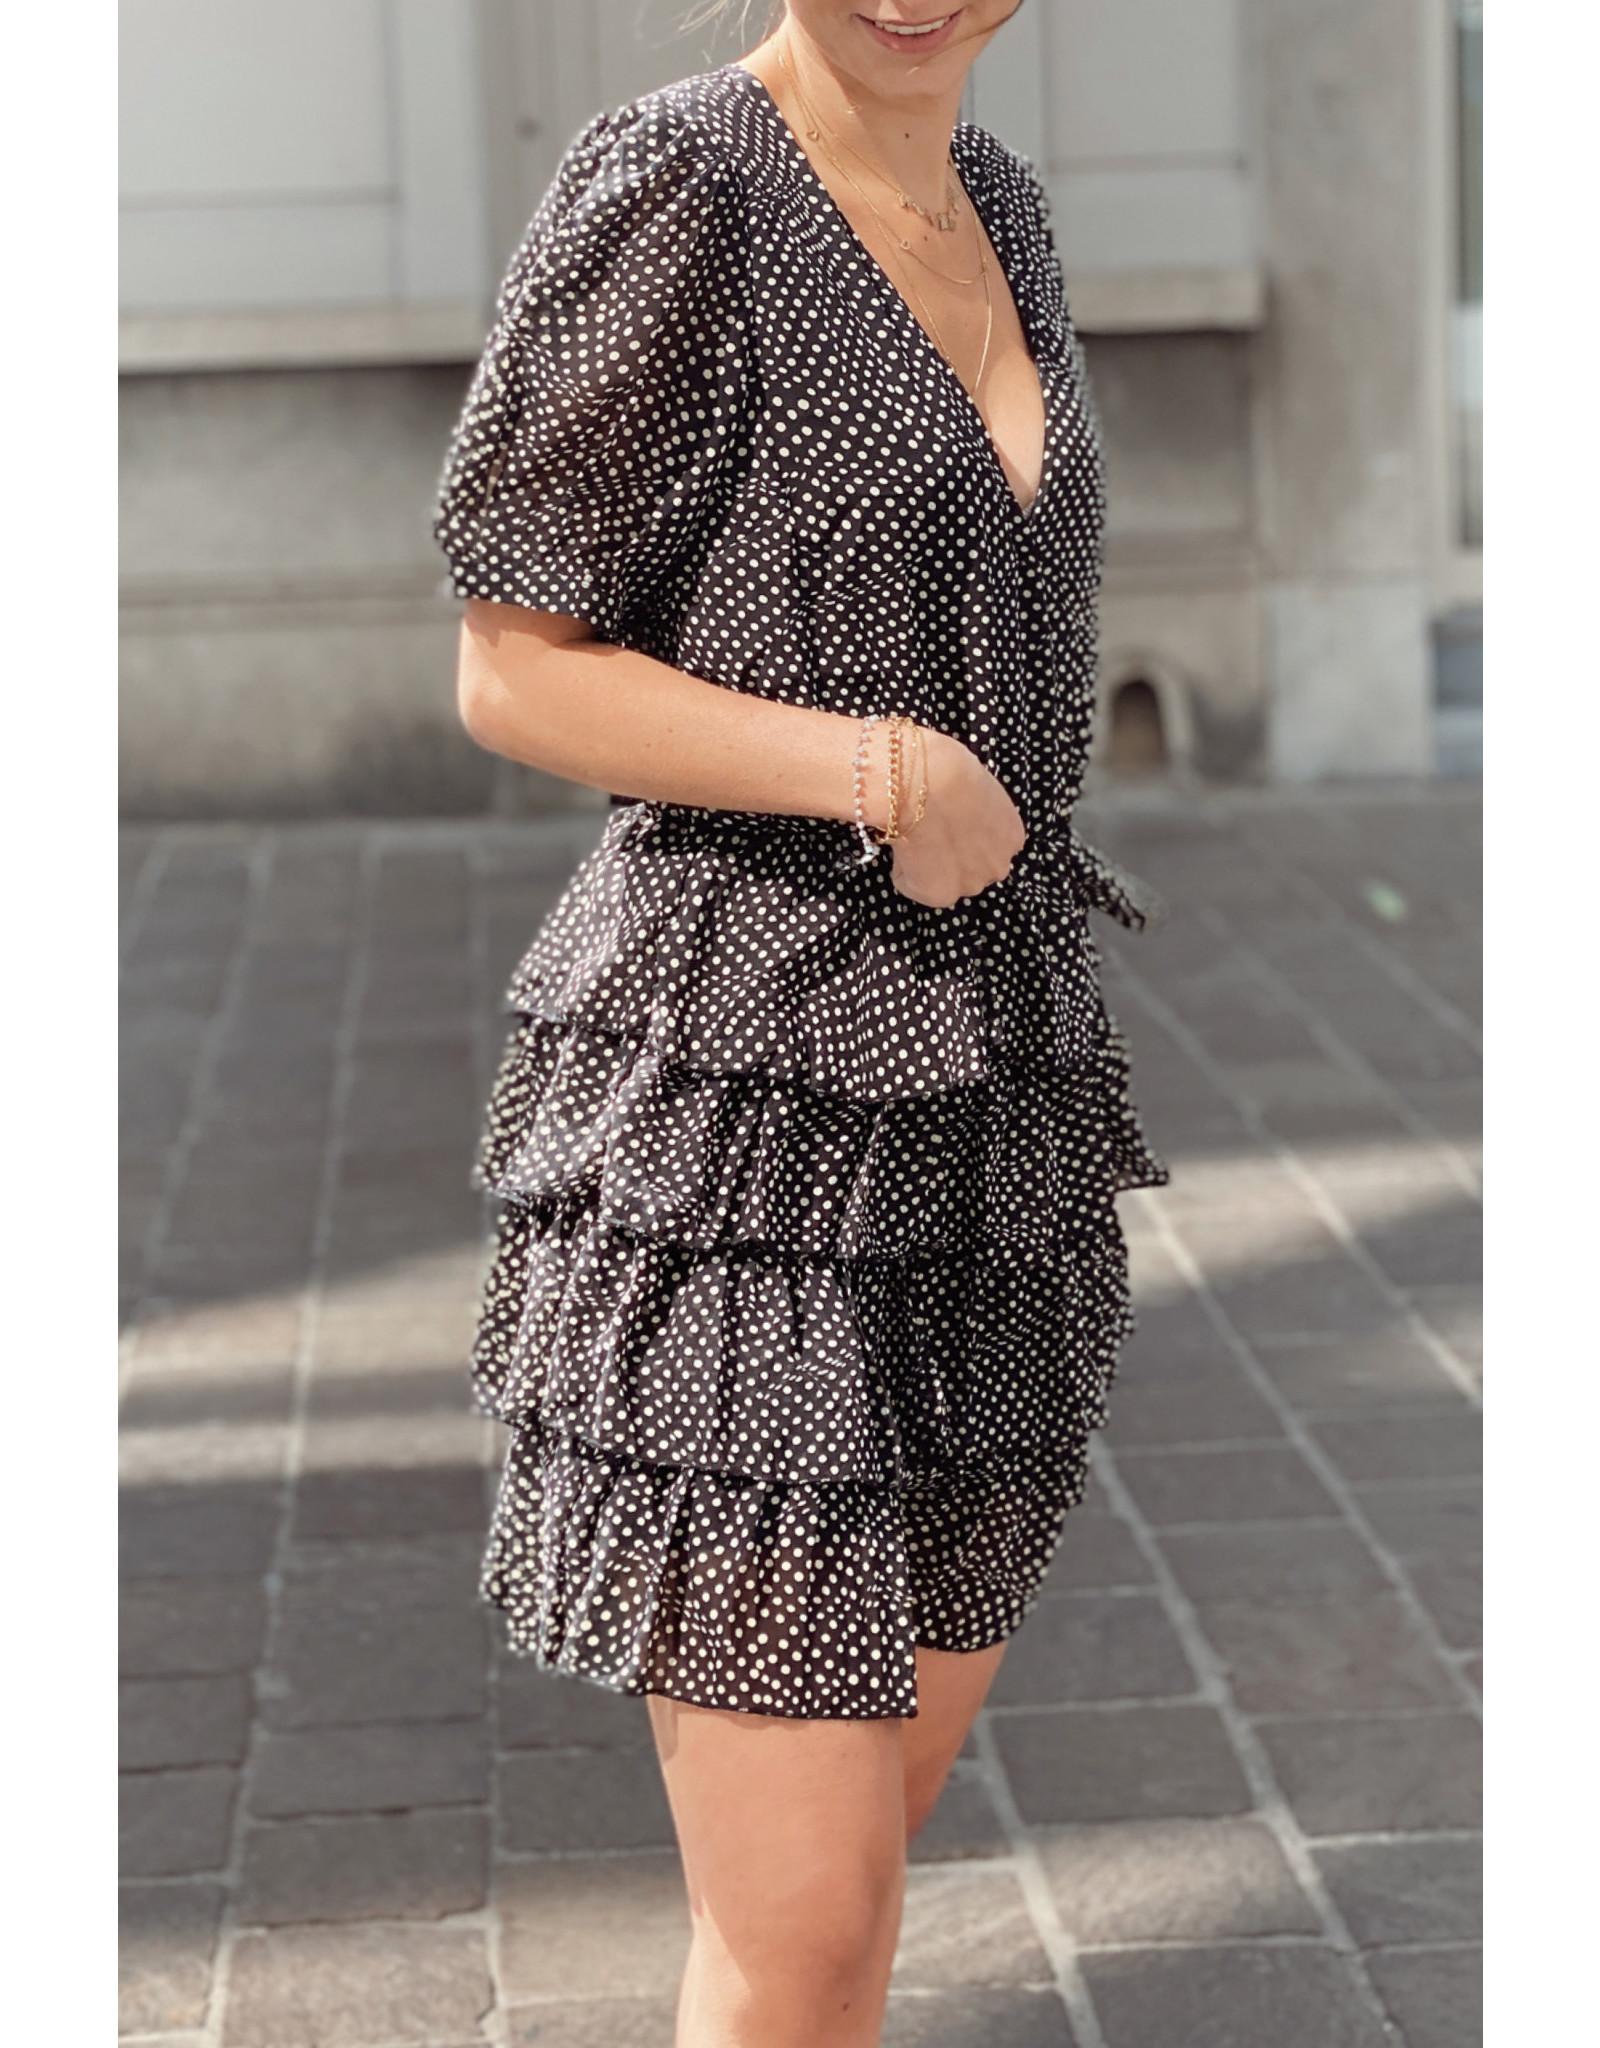 Ruffle dotted dress black/beige